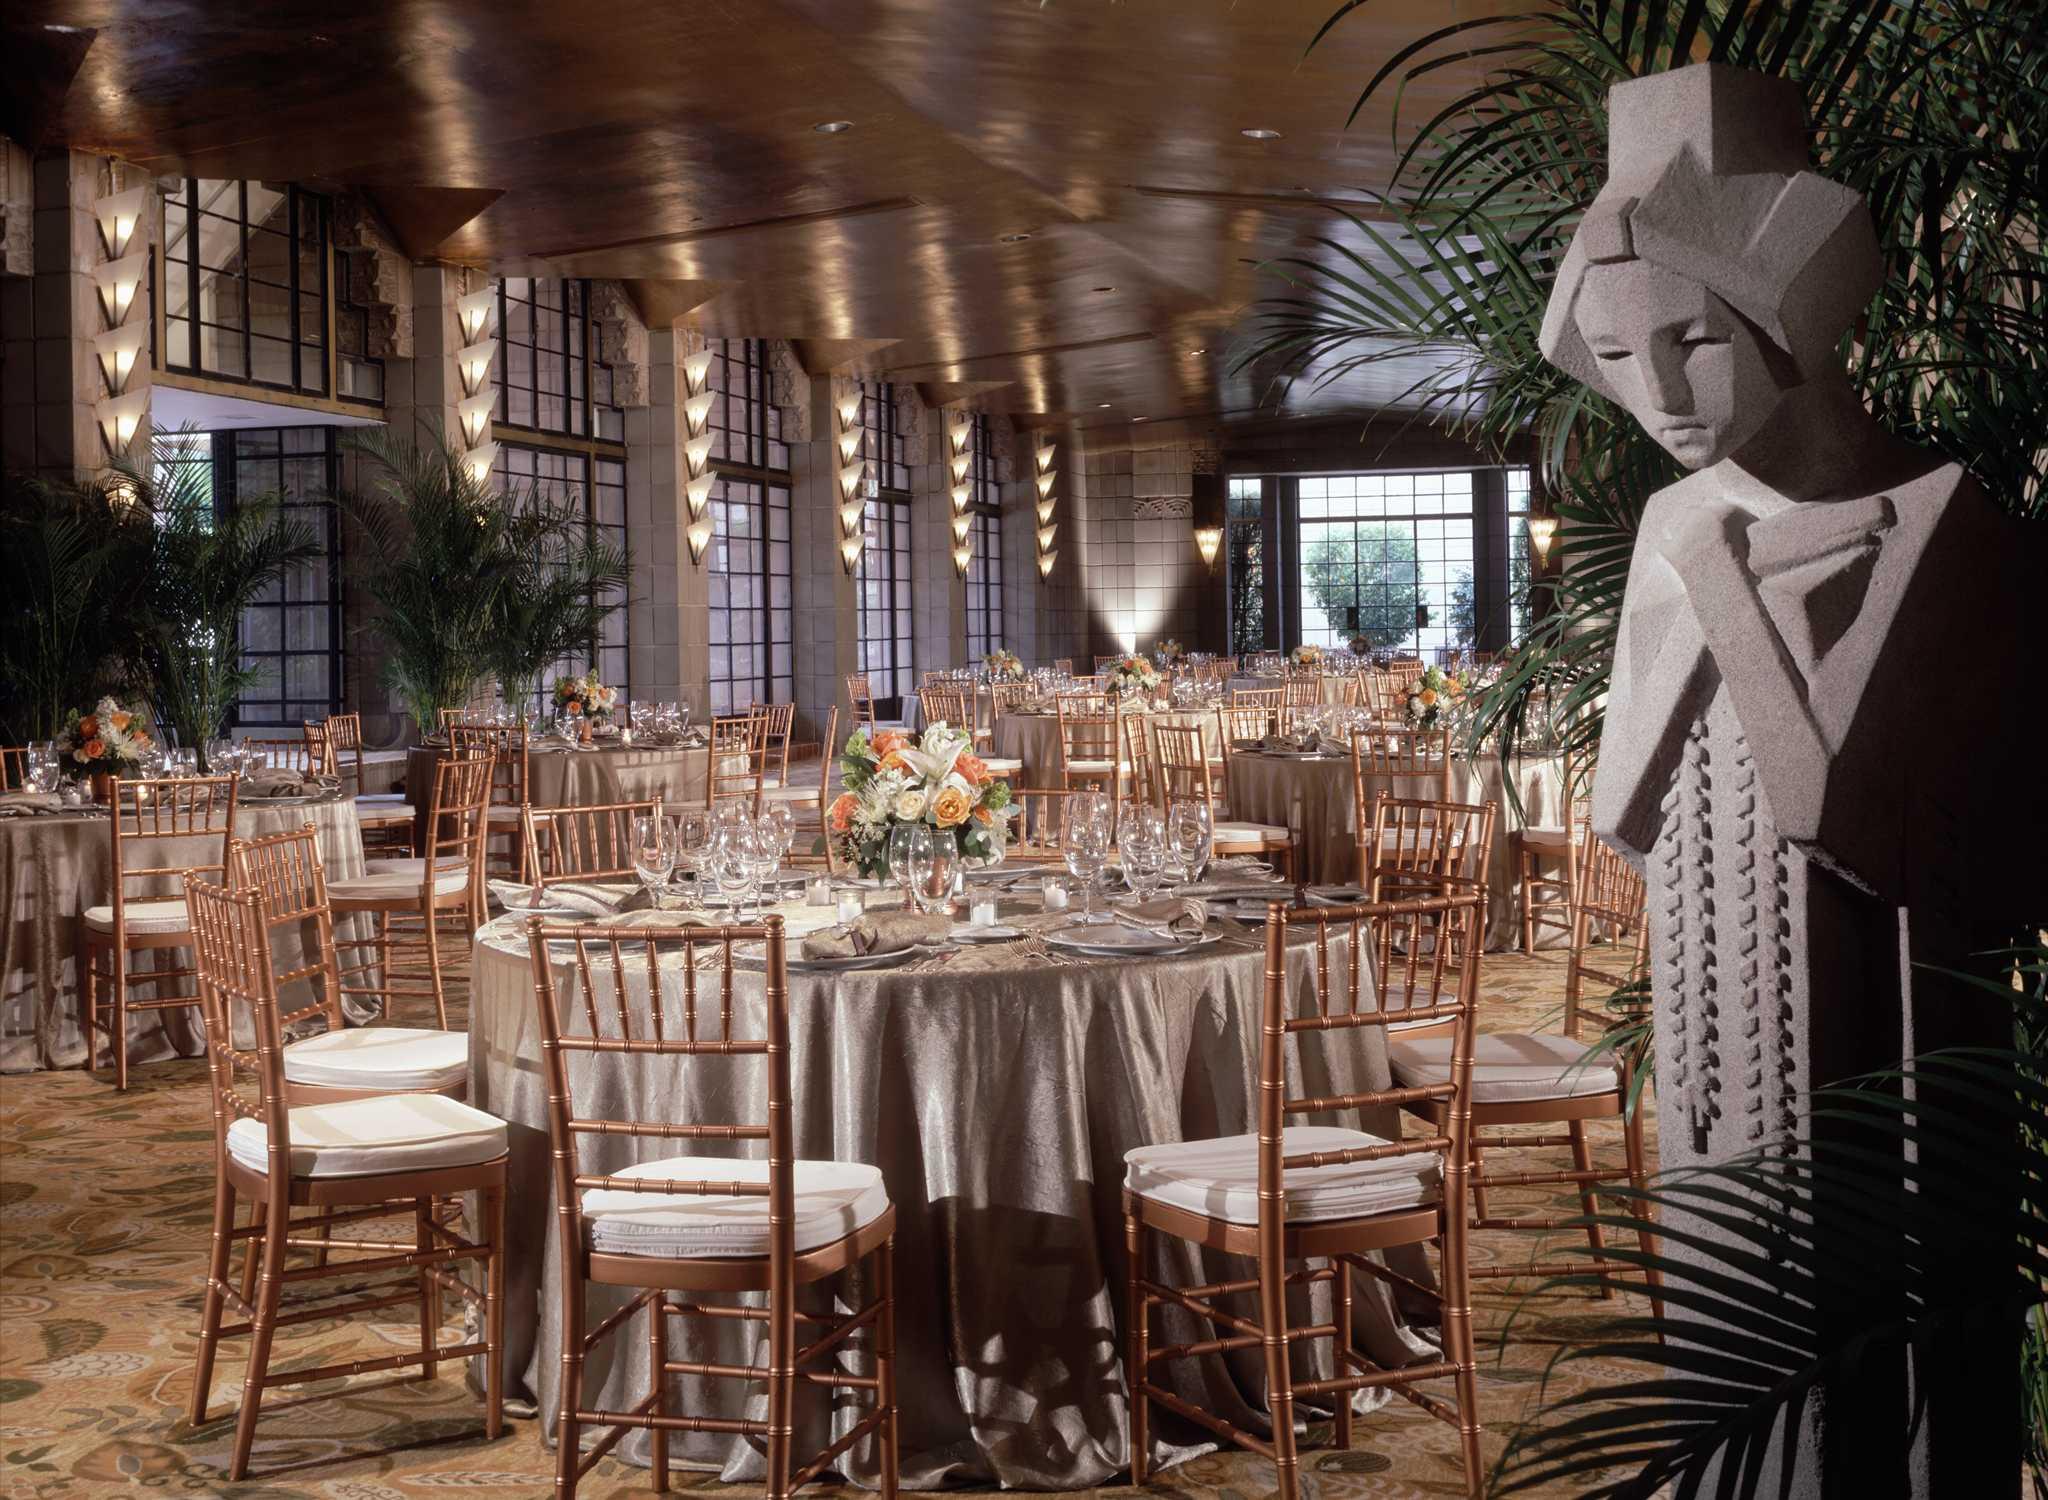 Hotel Arizona Biltmore, Phoenix - Waldorf Astoria